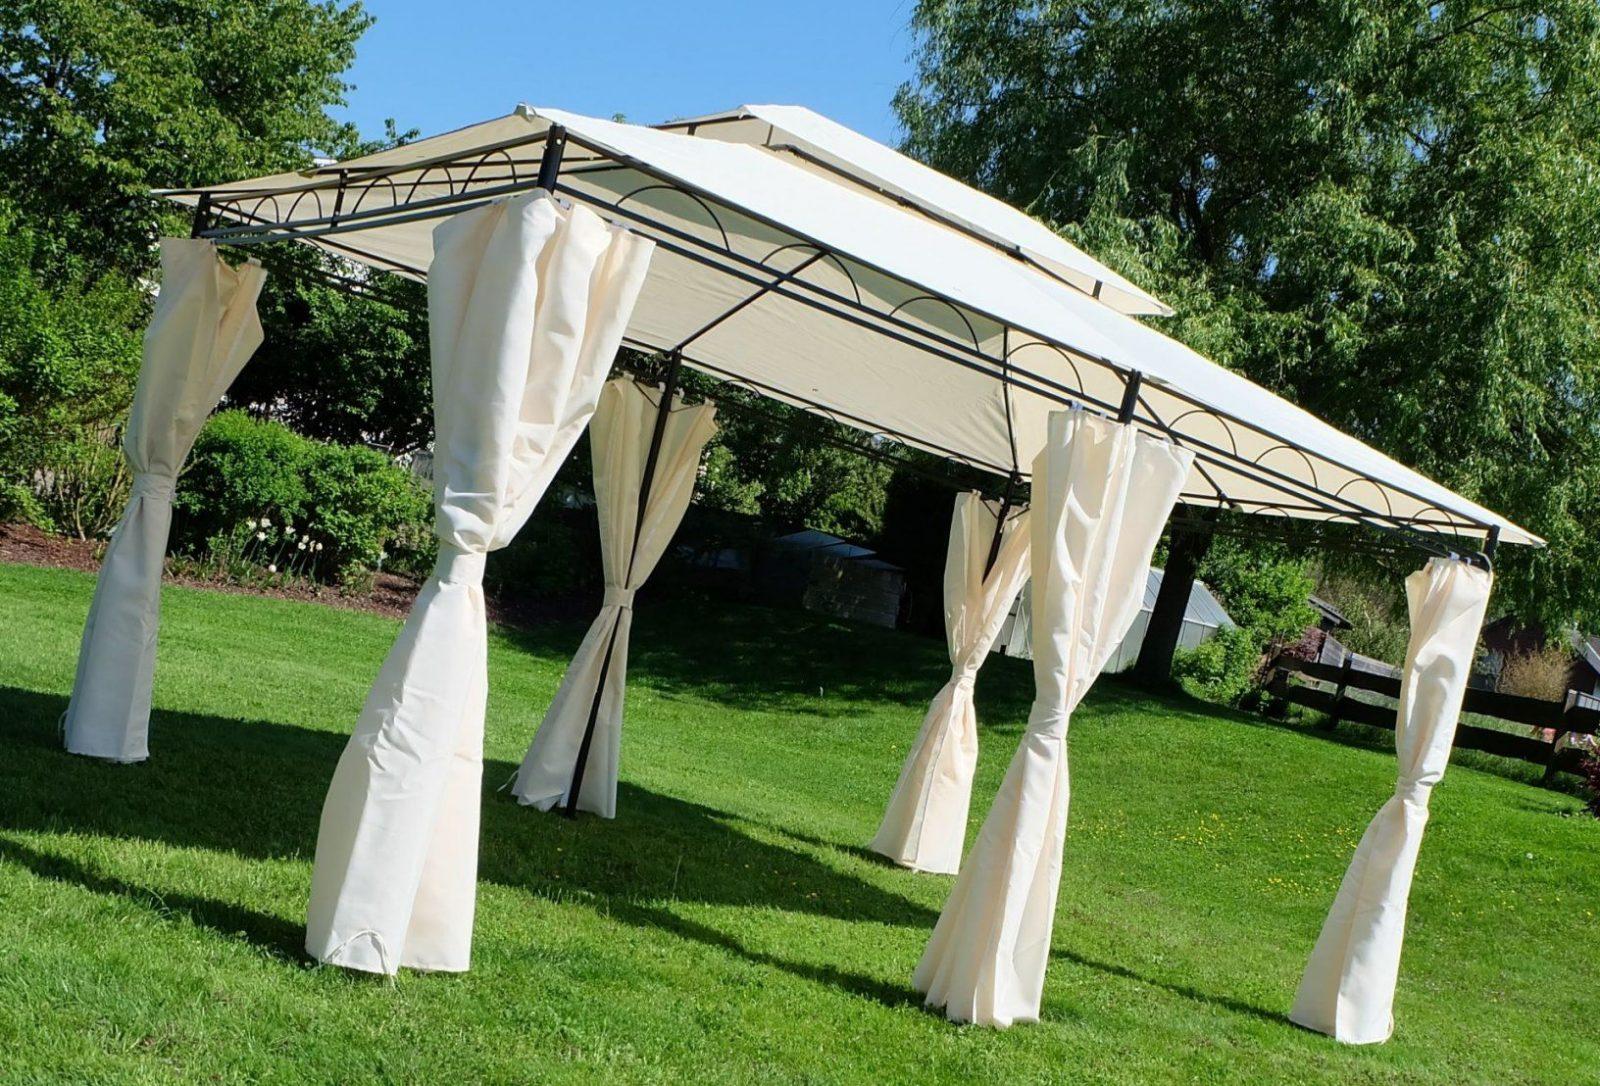 Hausdesign Pavillon 4X4 Meter Eleganter Gartenpavillon 3X4 Dach 100 von Ersatzdach Pavillon 4X4 Wasserdicht Bild